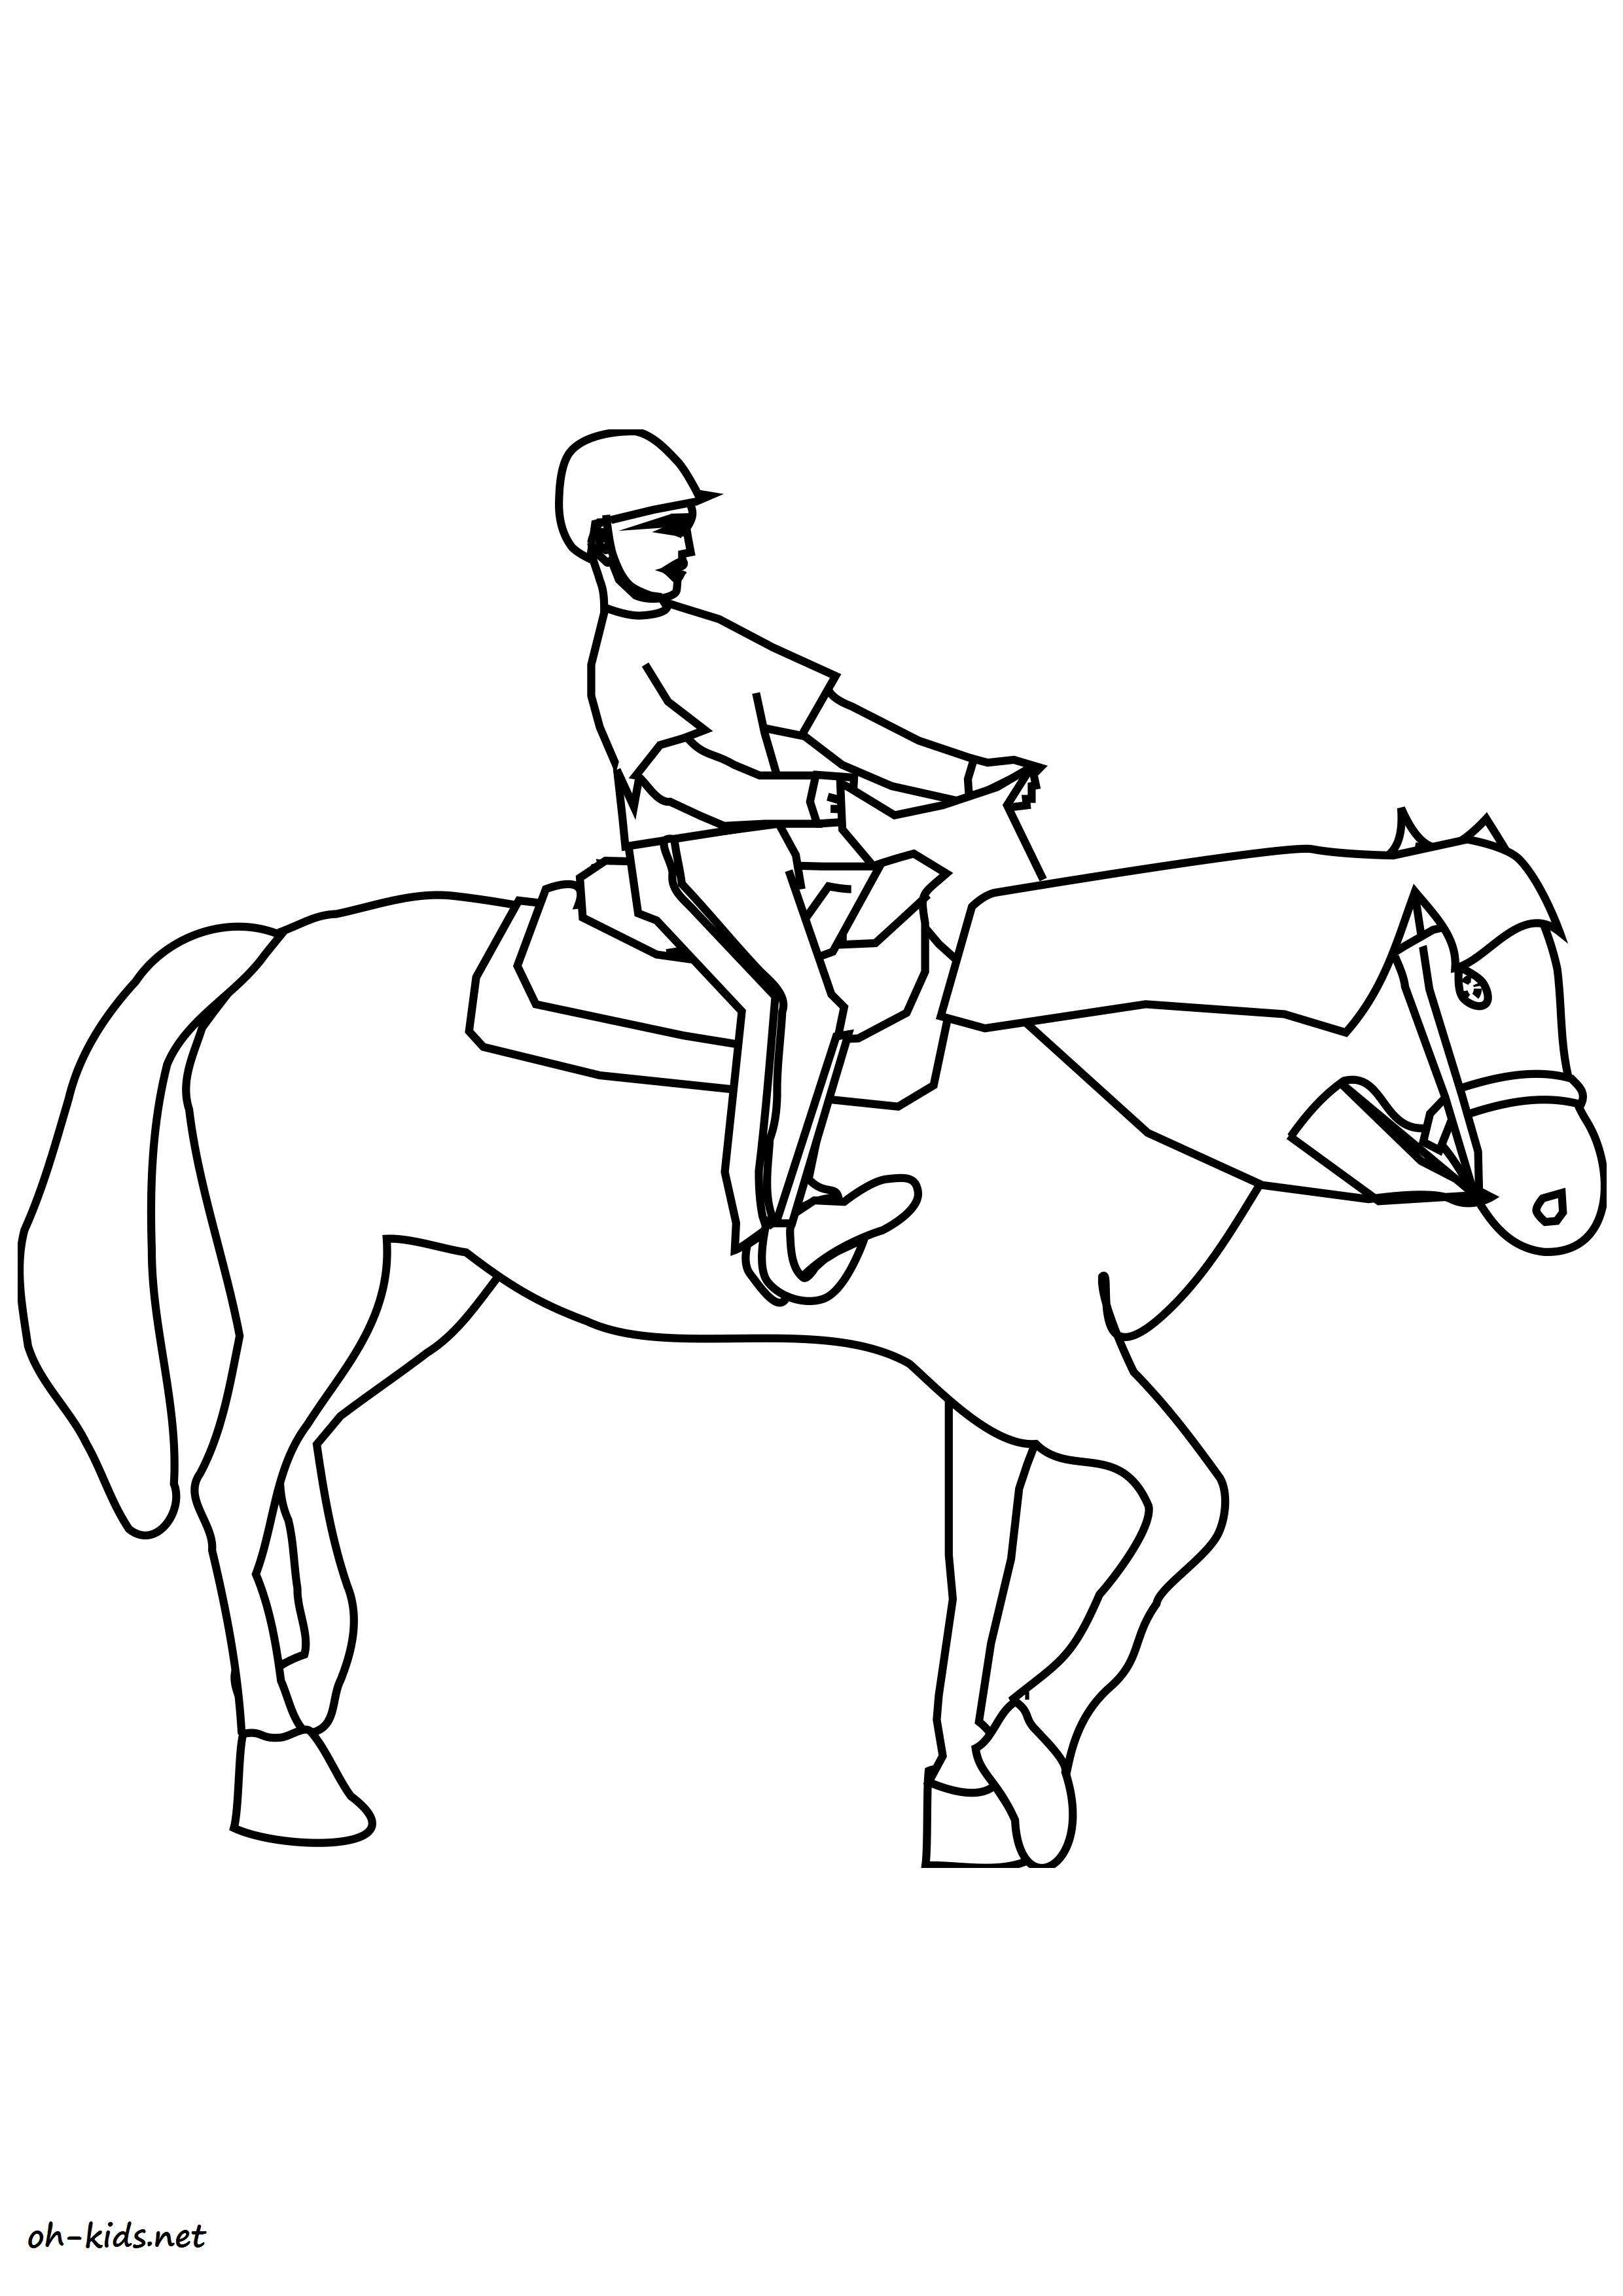 image de équitation a dessiner Dessin 1370